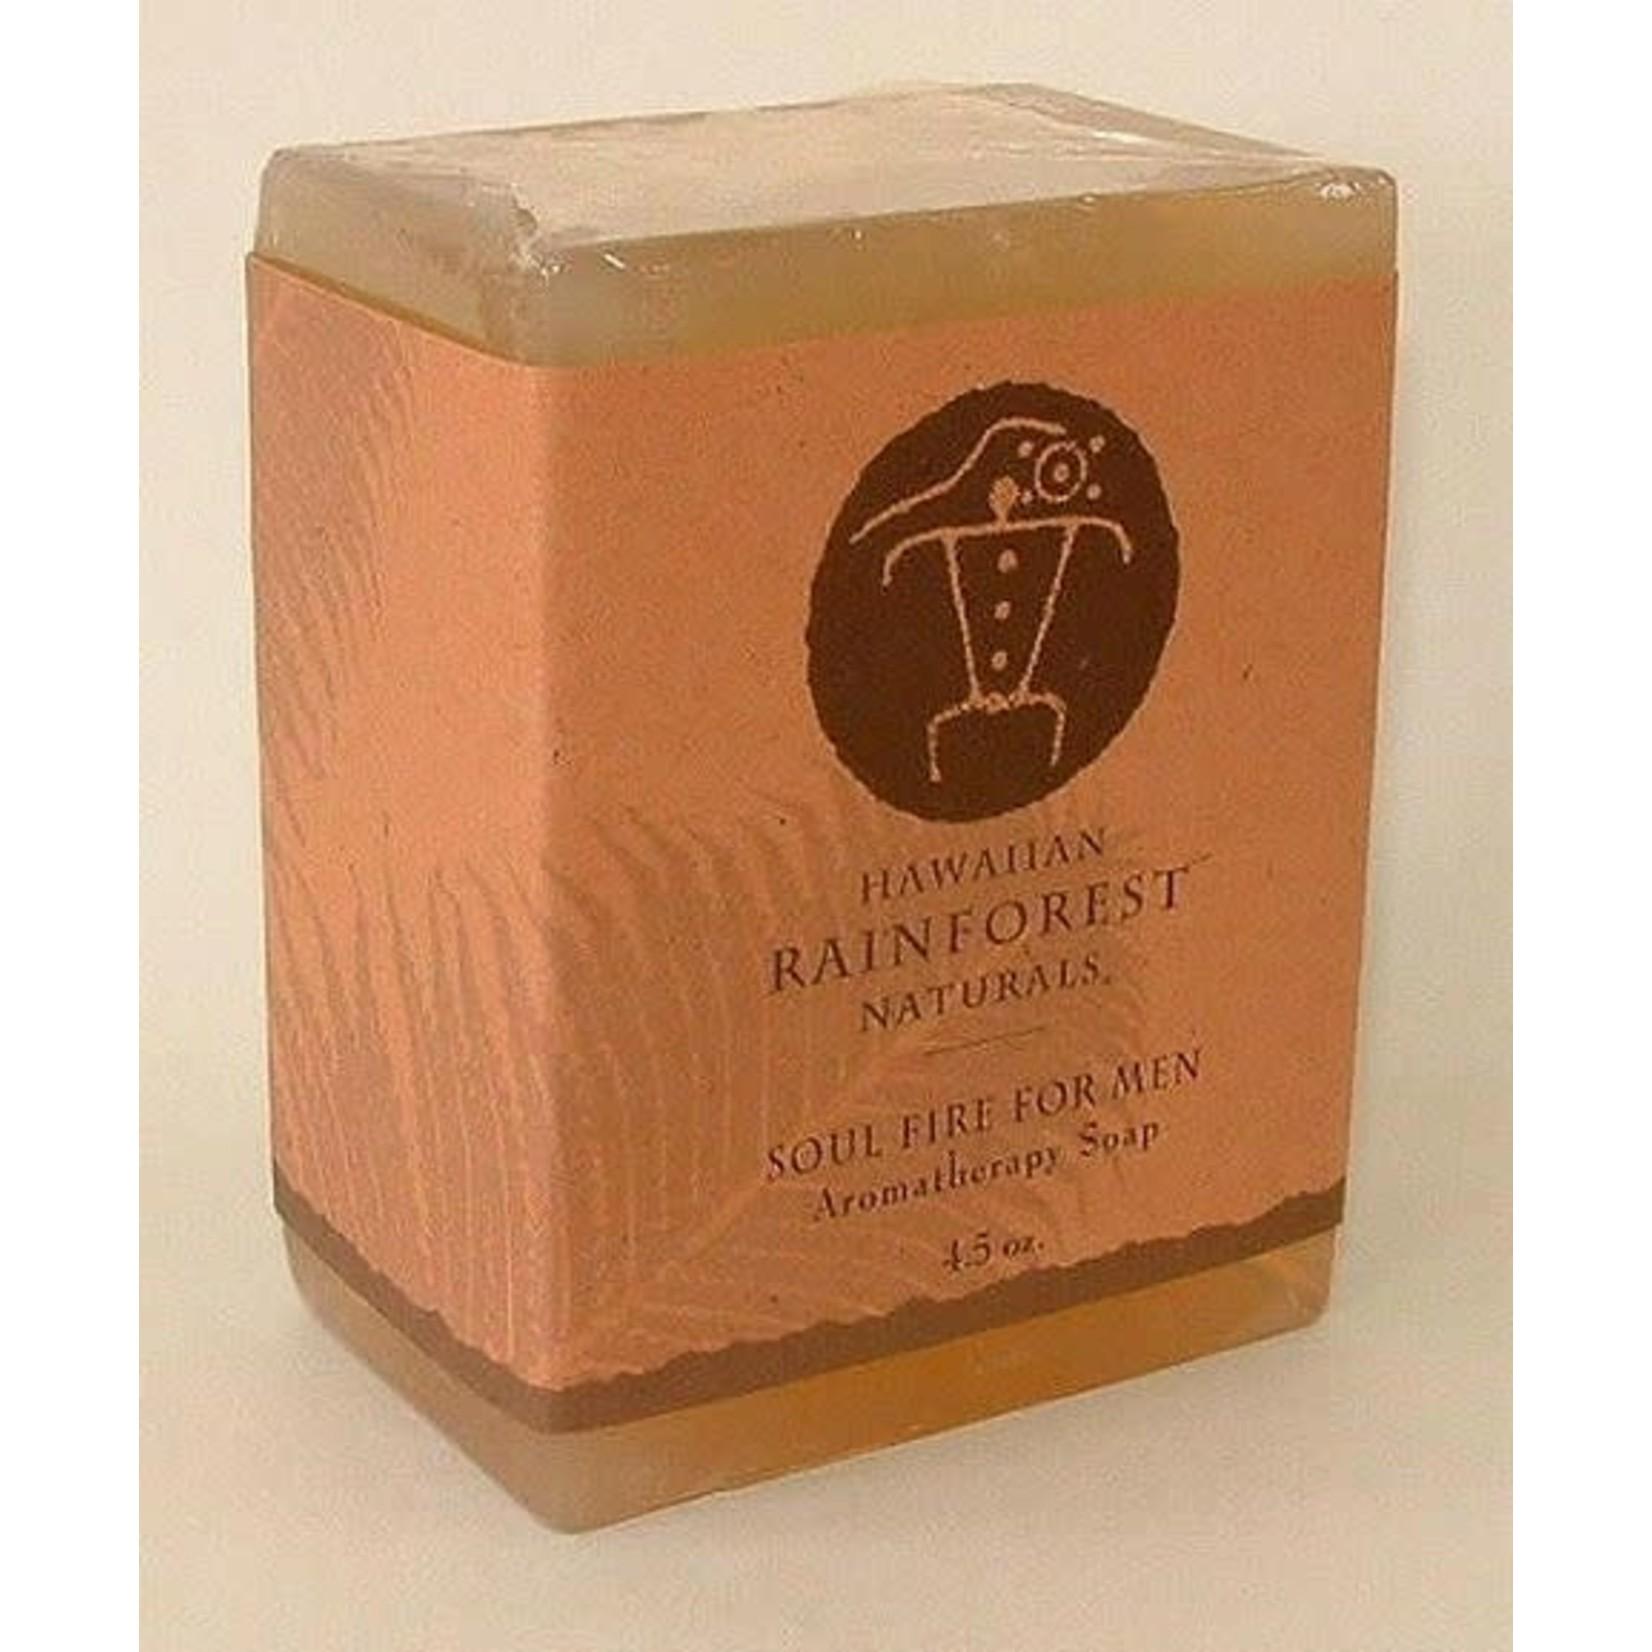 Hawaiian Rainforest Naturals Inc. Soul Fire For Men Aromatherapy Soap